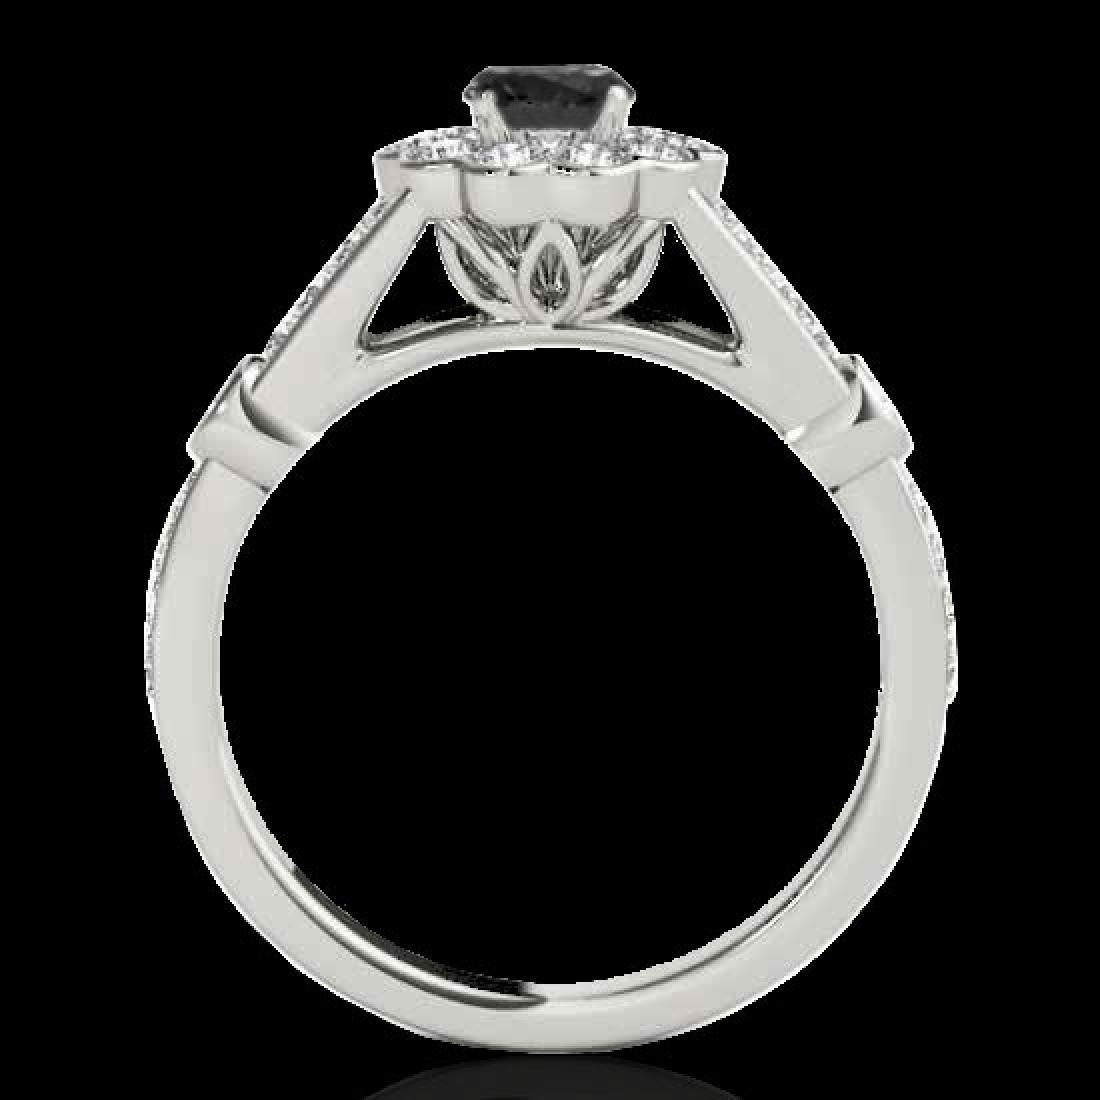 1.9 CTW Certified VS Black Diamond Solitaire Halo Ring